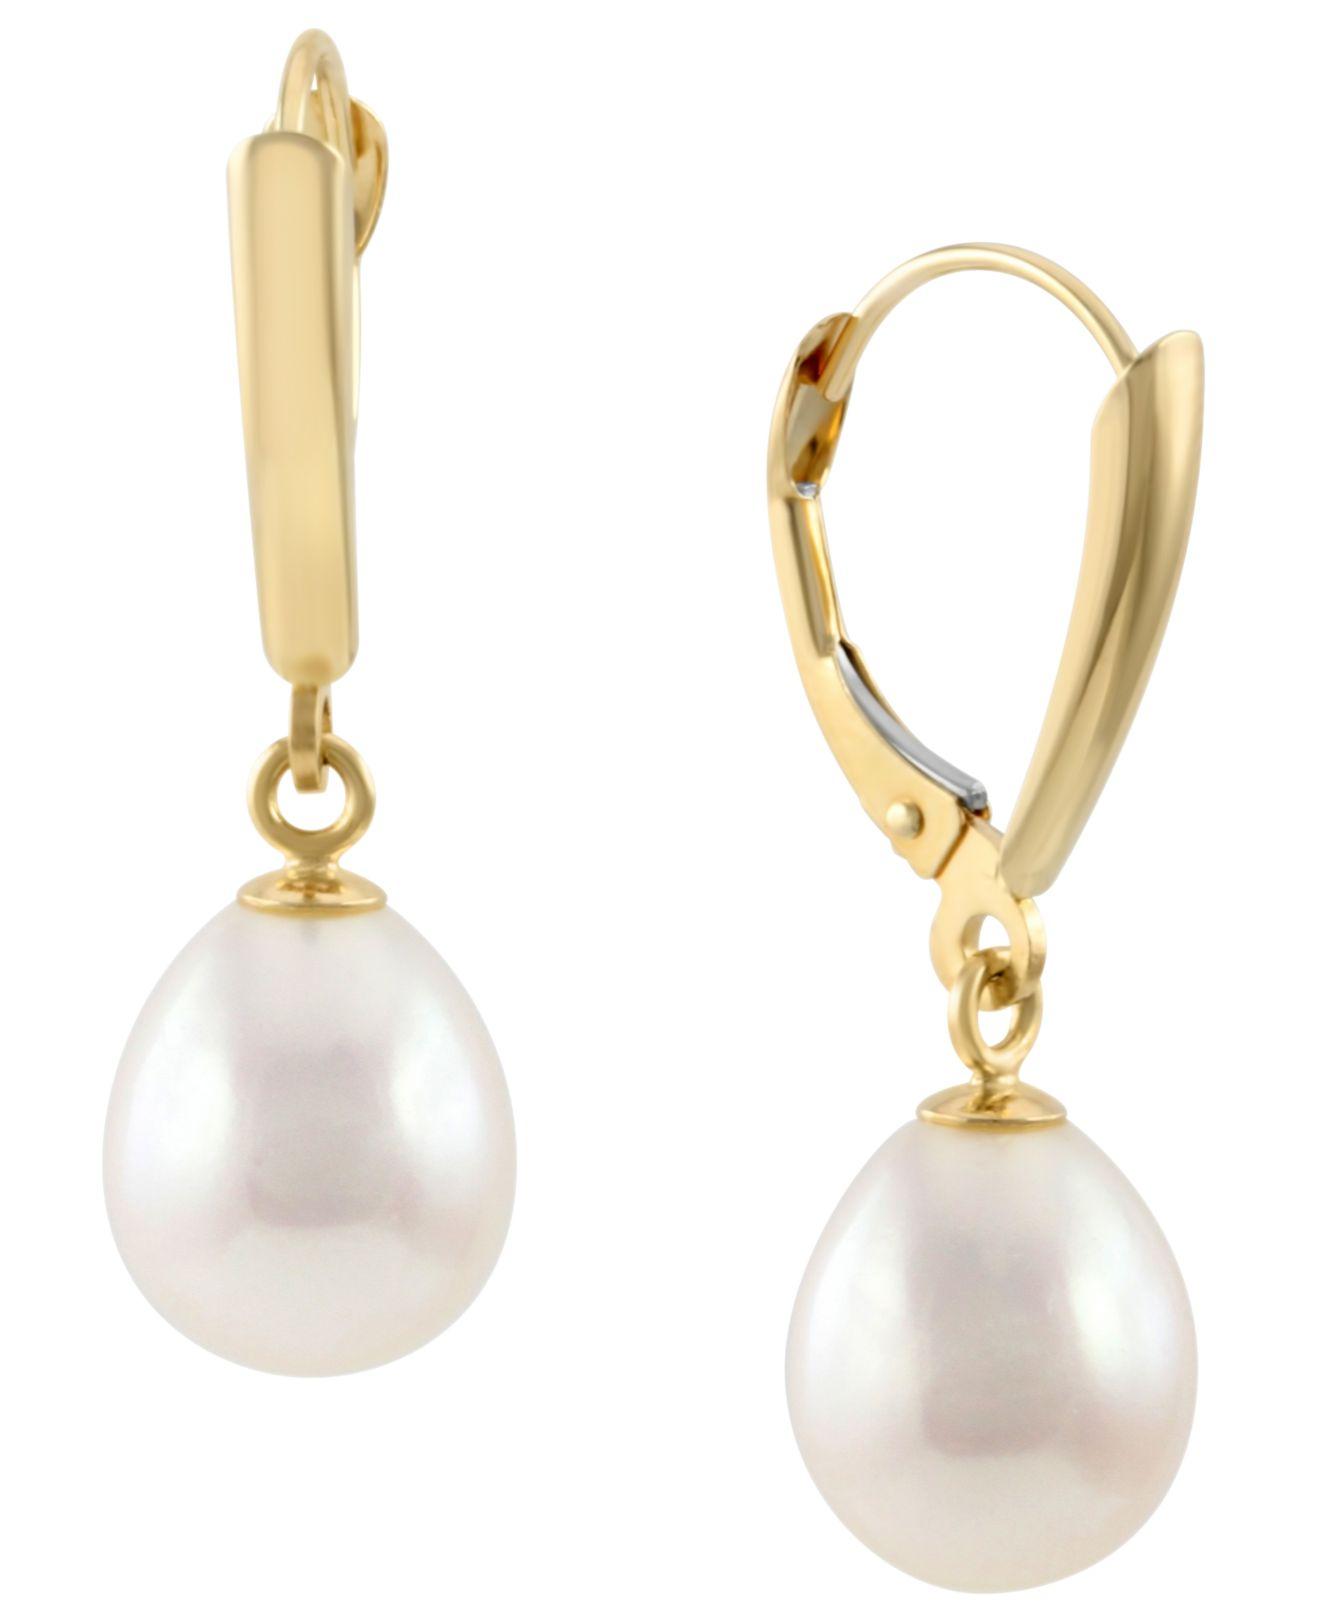 Macy S 10k Gold Earrings Cultured Freshwater Pearl Leverback